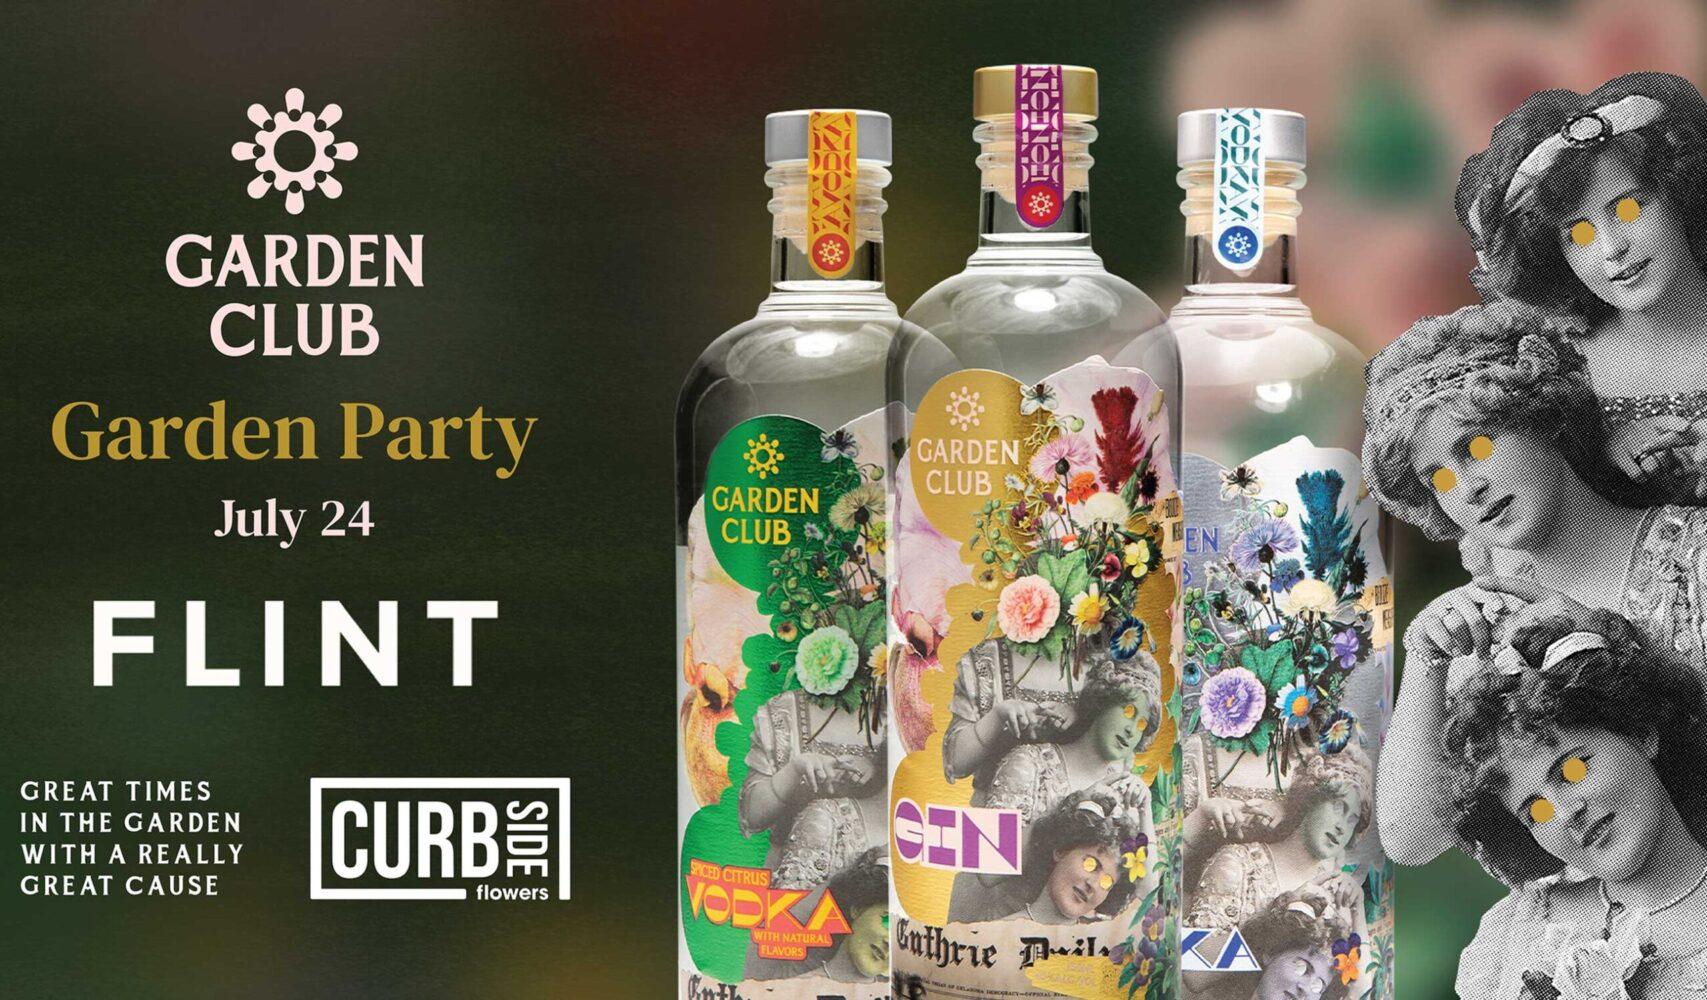 garden club garden party july 24 flint poster